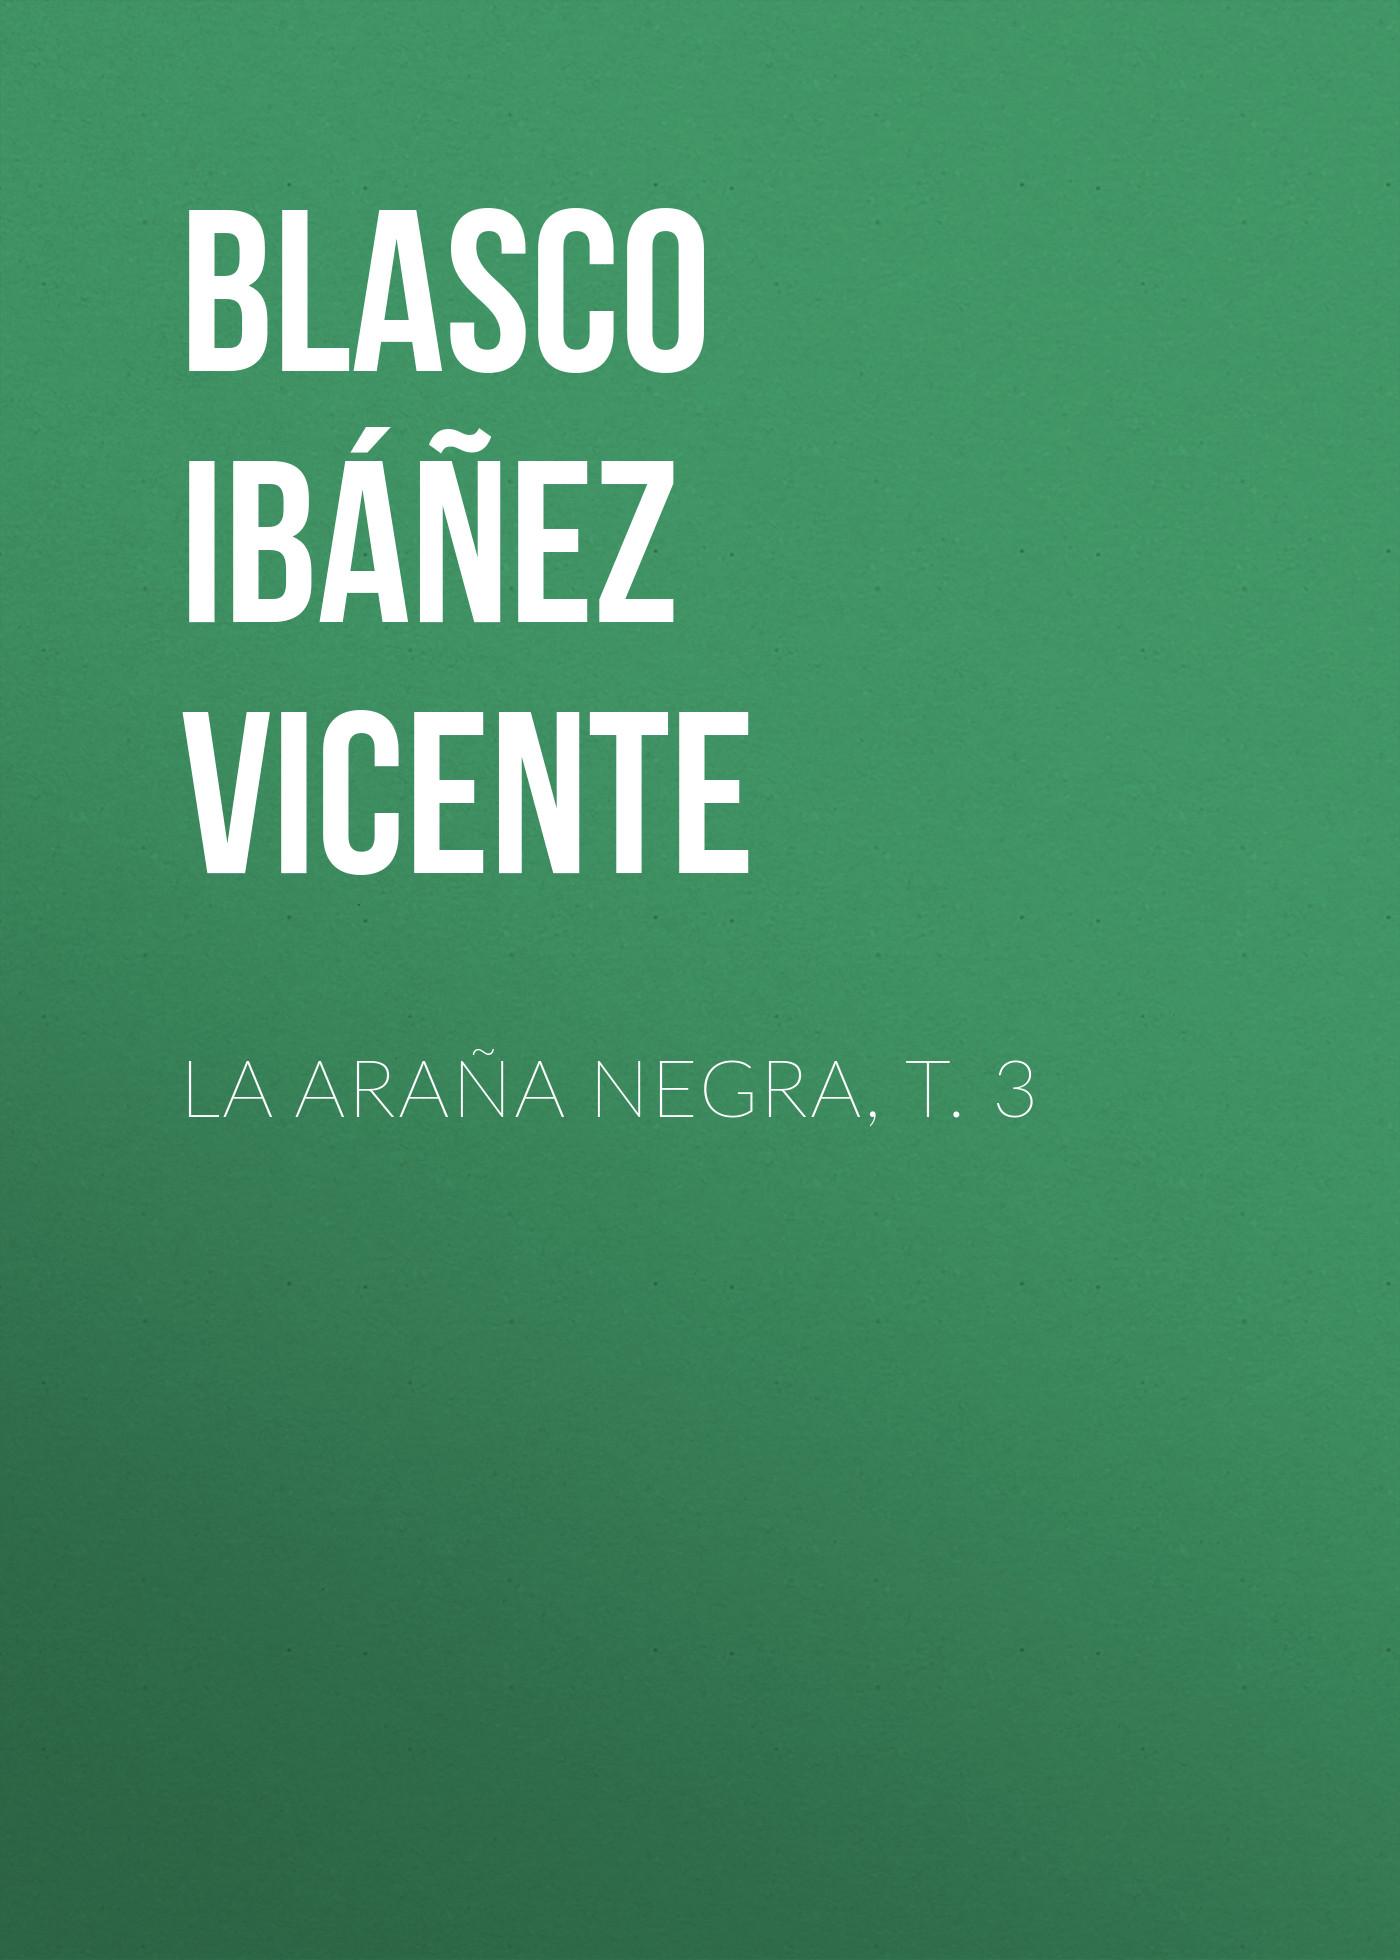 Blasco Ibáñez Vicente La araña negra, t. 3 blasco ibáñez vicente la araña negra t 1